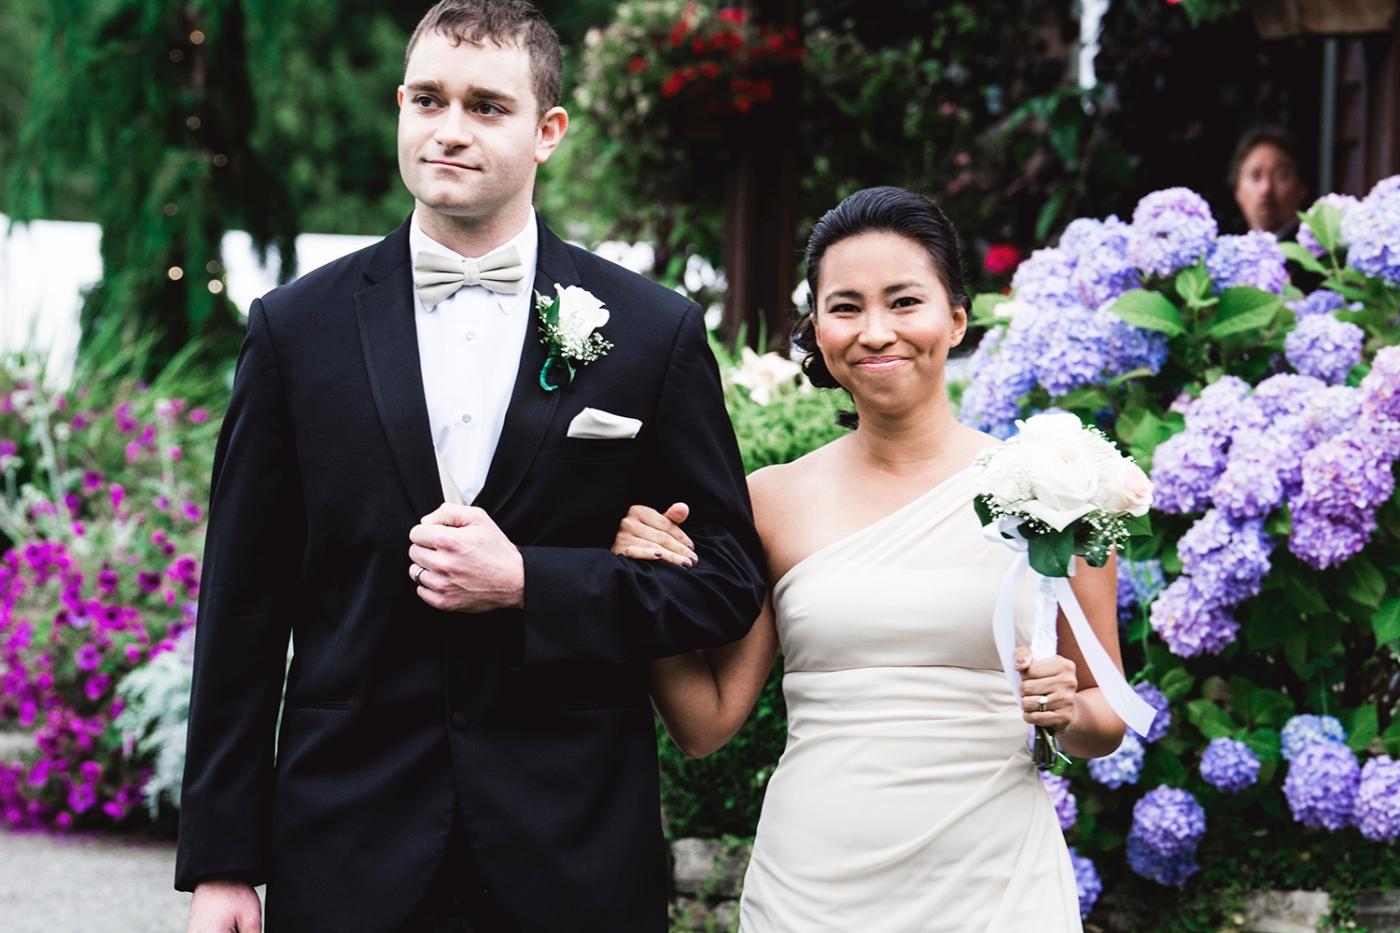 Jane_Speleers_2016_Details_Wedding_Wild_Rose_Estates_Venue_JS7_7726